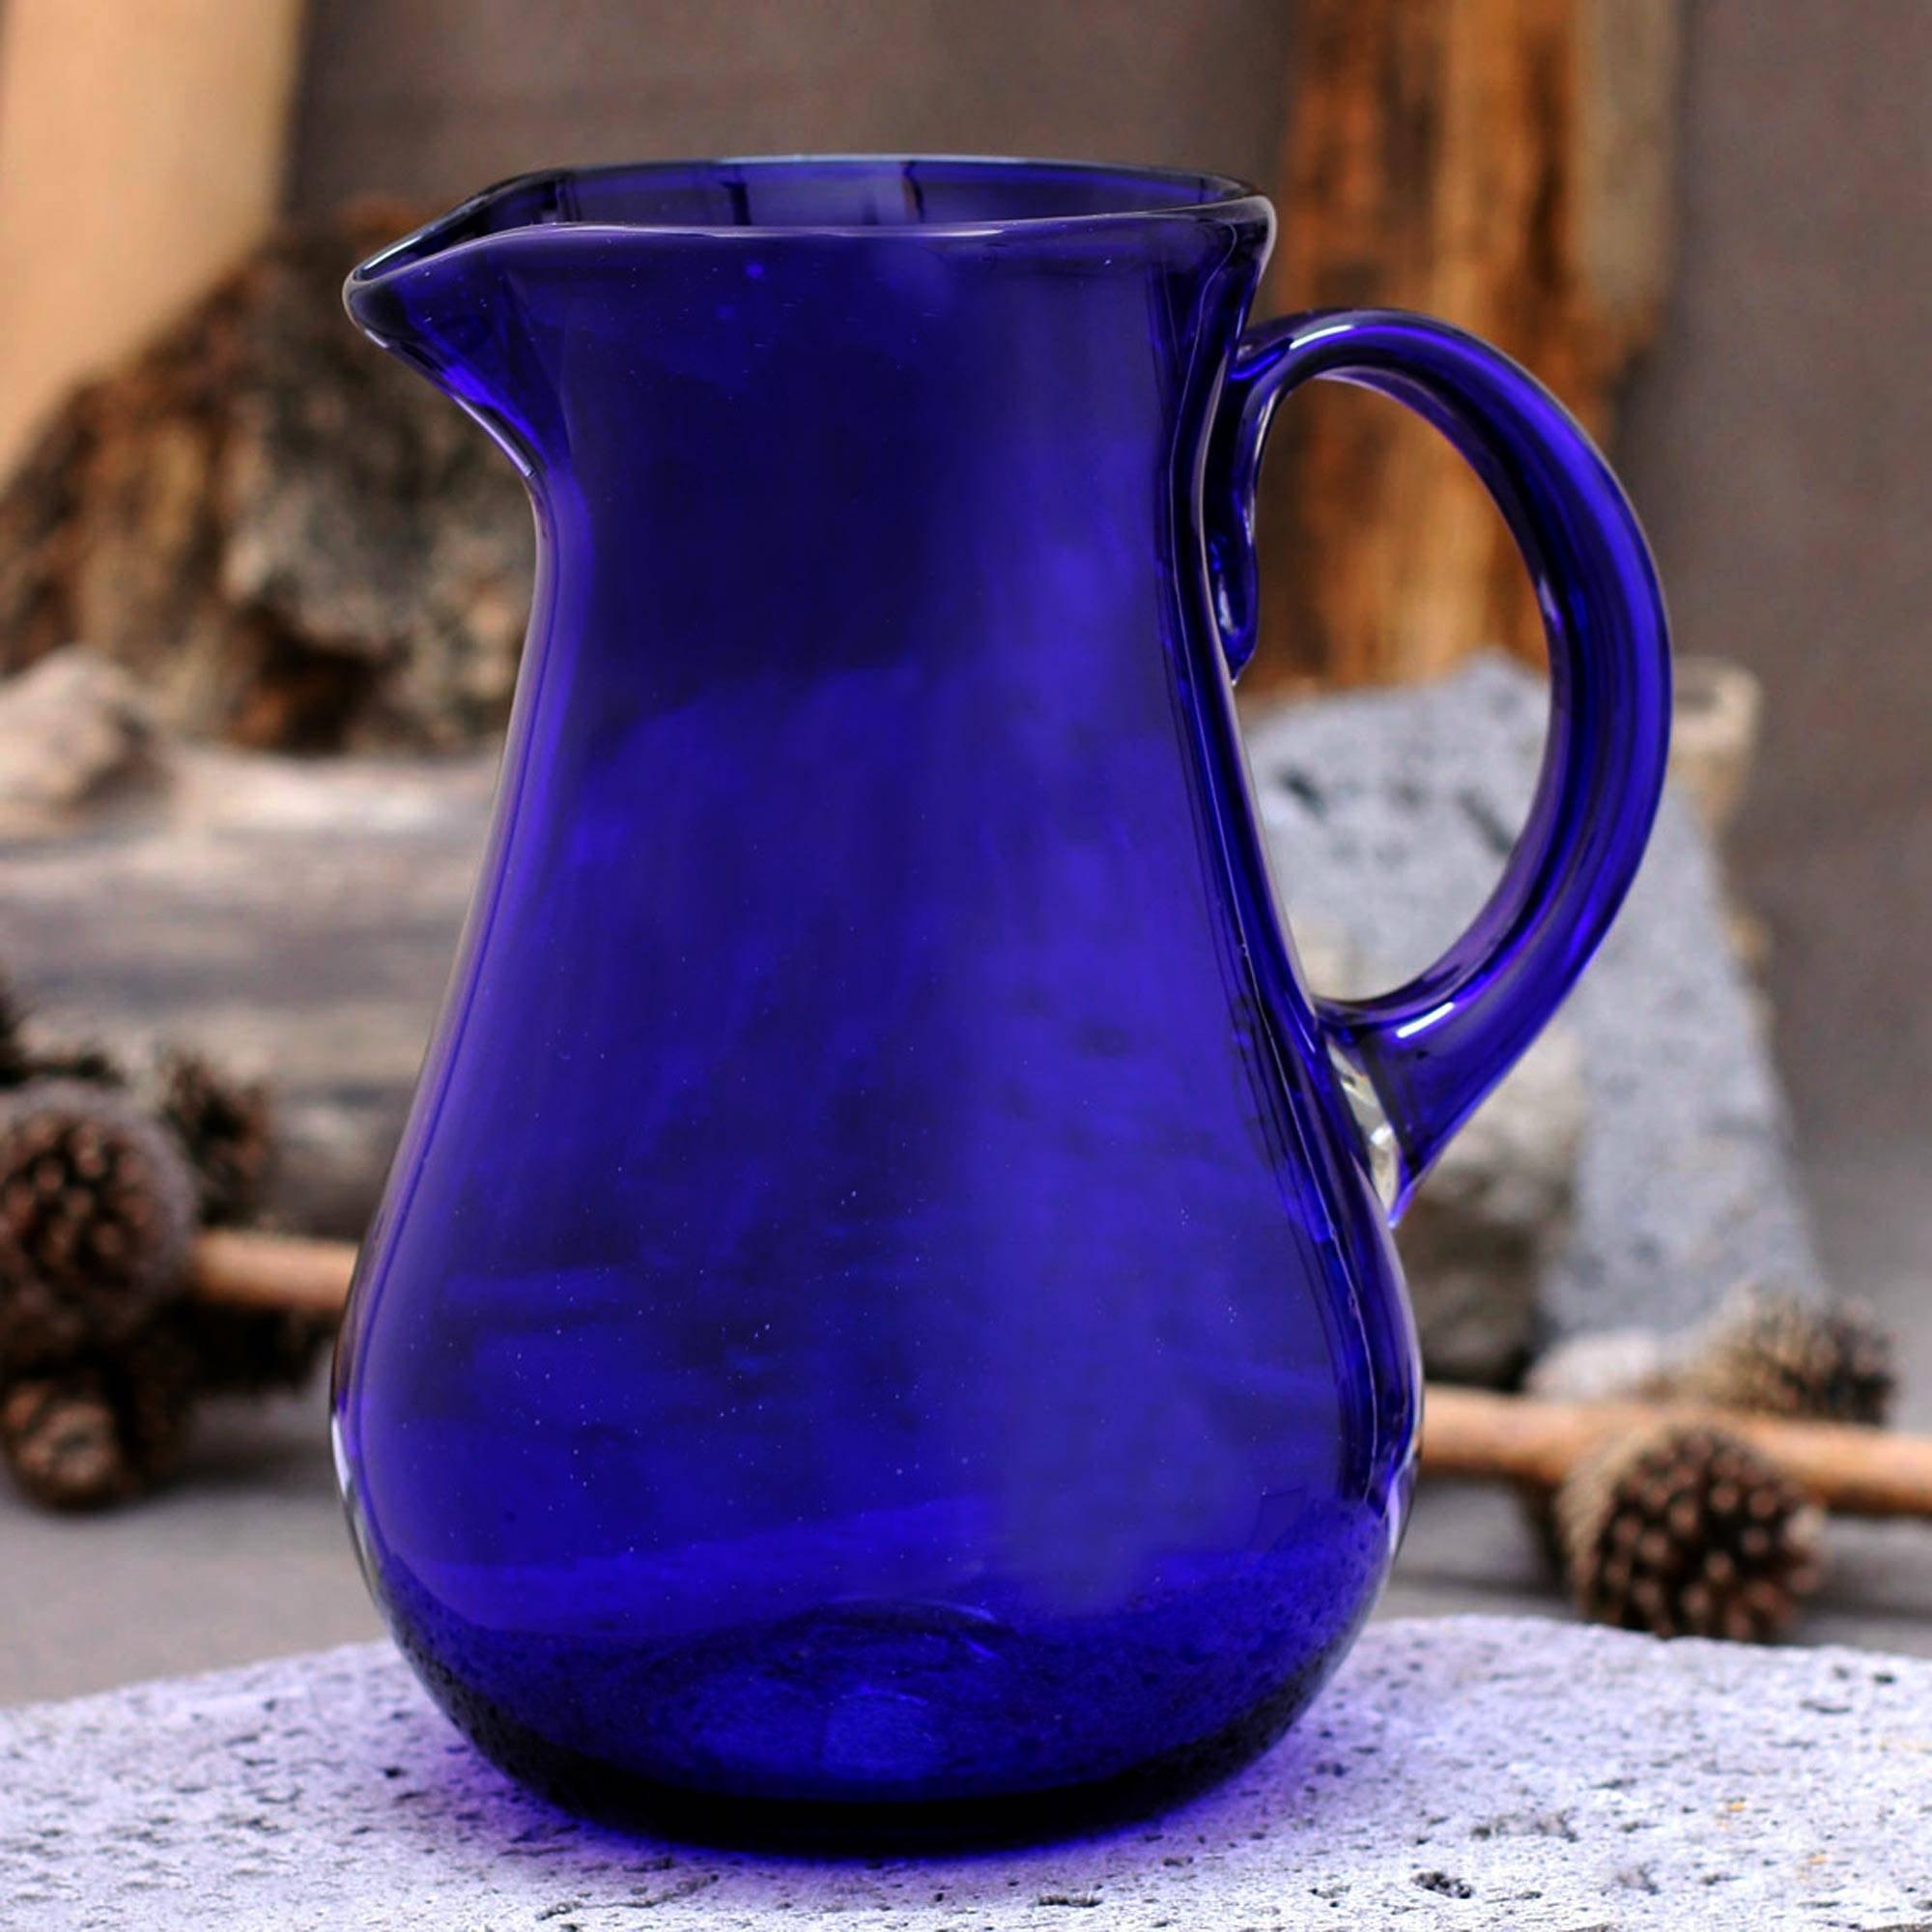 NOVICA Large Blue Hand Blown Glass Pitcher for Water, Margaritas, Lemonade, 82 oz, 'Cobalt Charm' by NOVICA (Image #2)